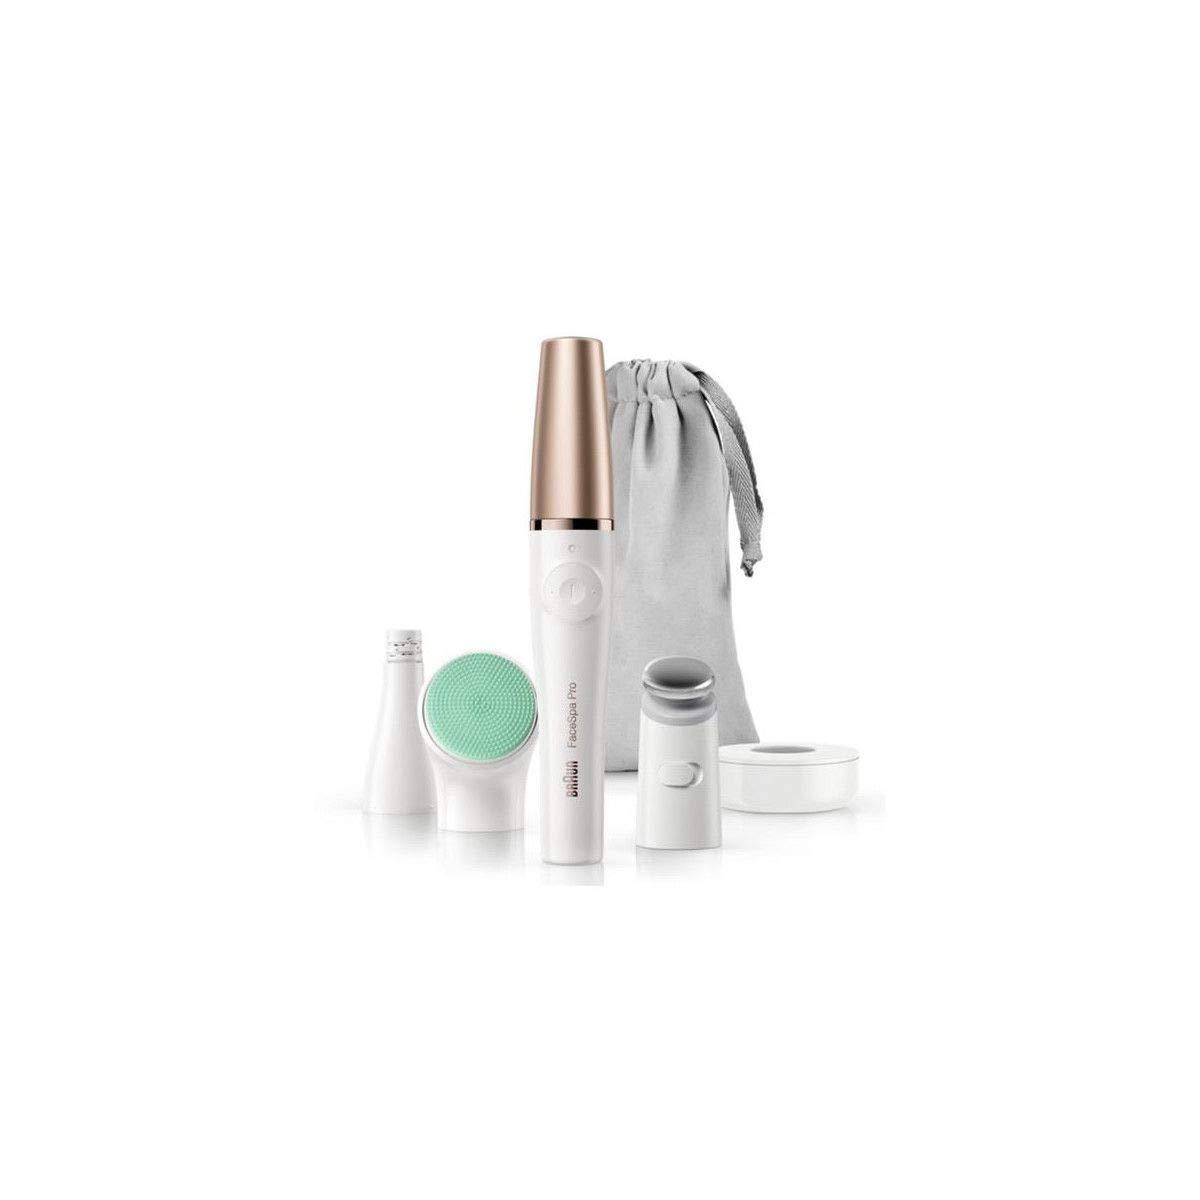 Braun FaceSpa Pro 913 Bronce, Blanco - Depiladora (Bronce, Blanco, Chin, Frente, Labio superior, 0,5 mm)